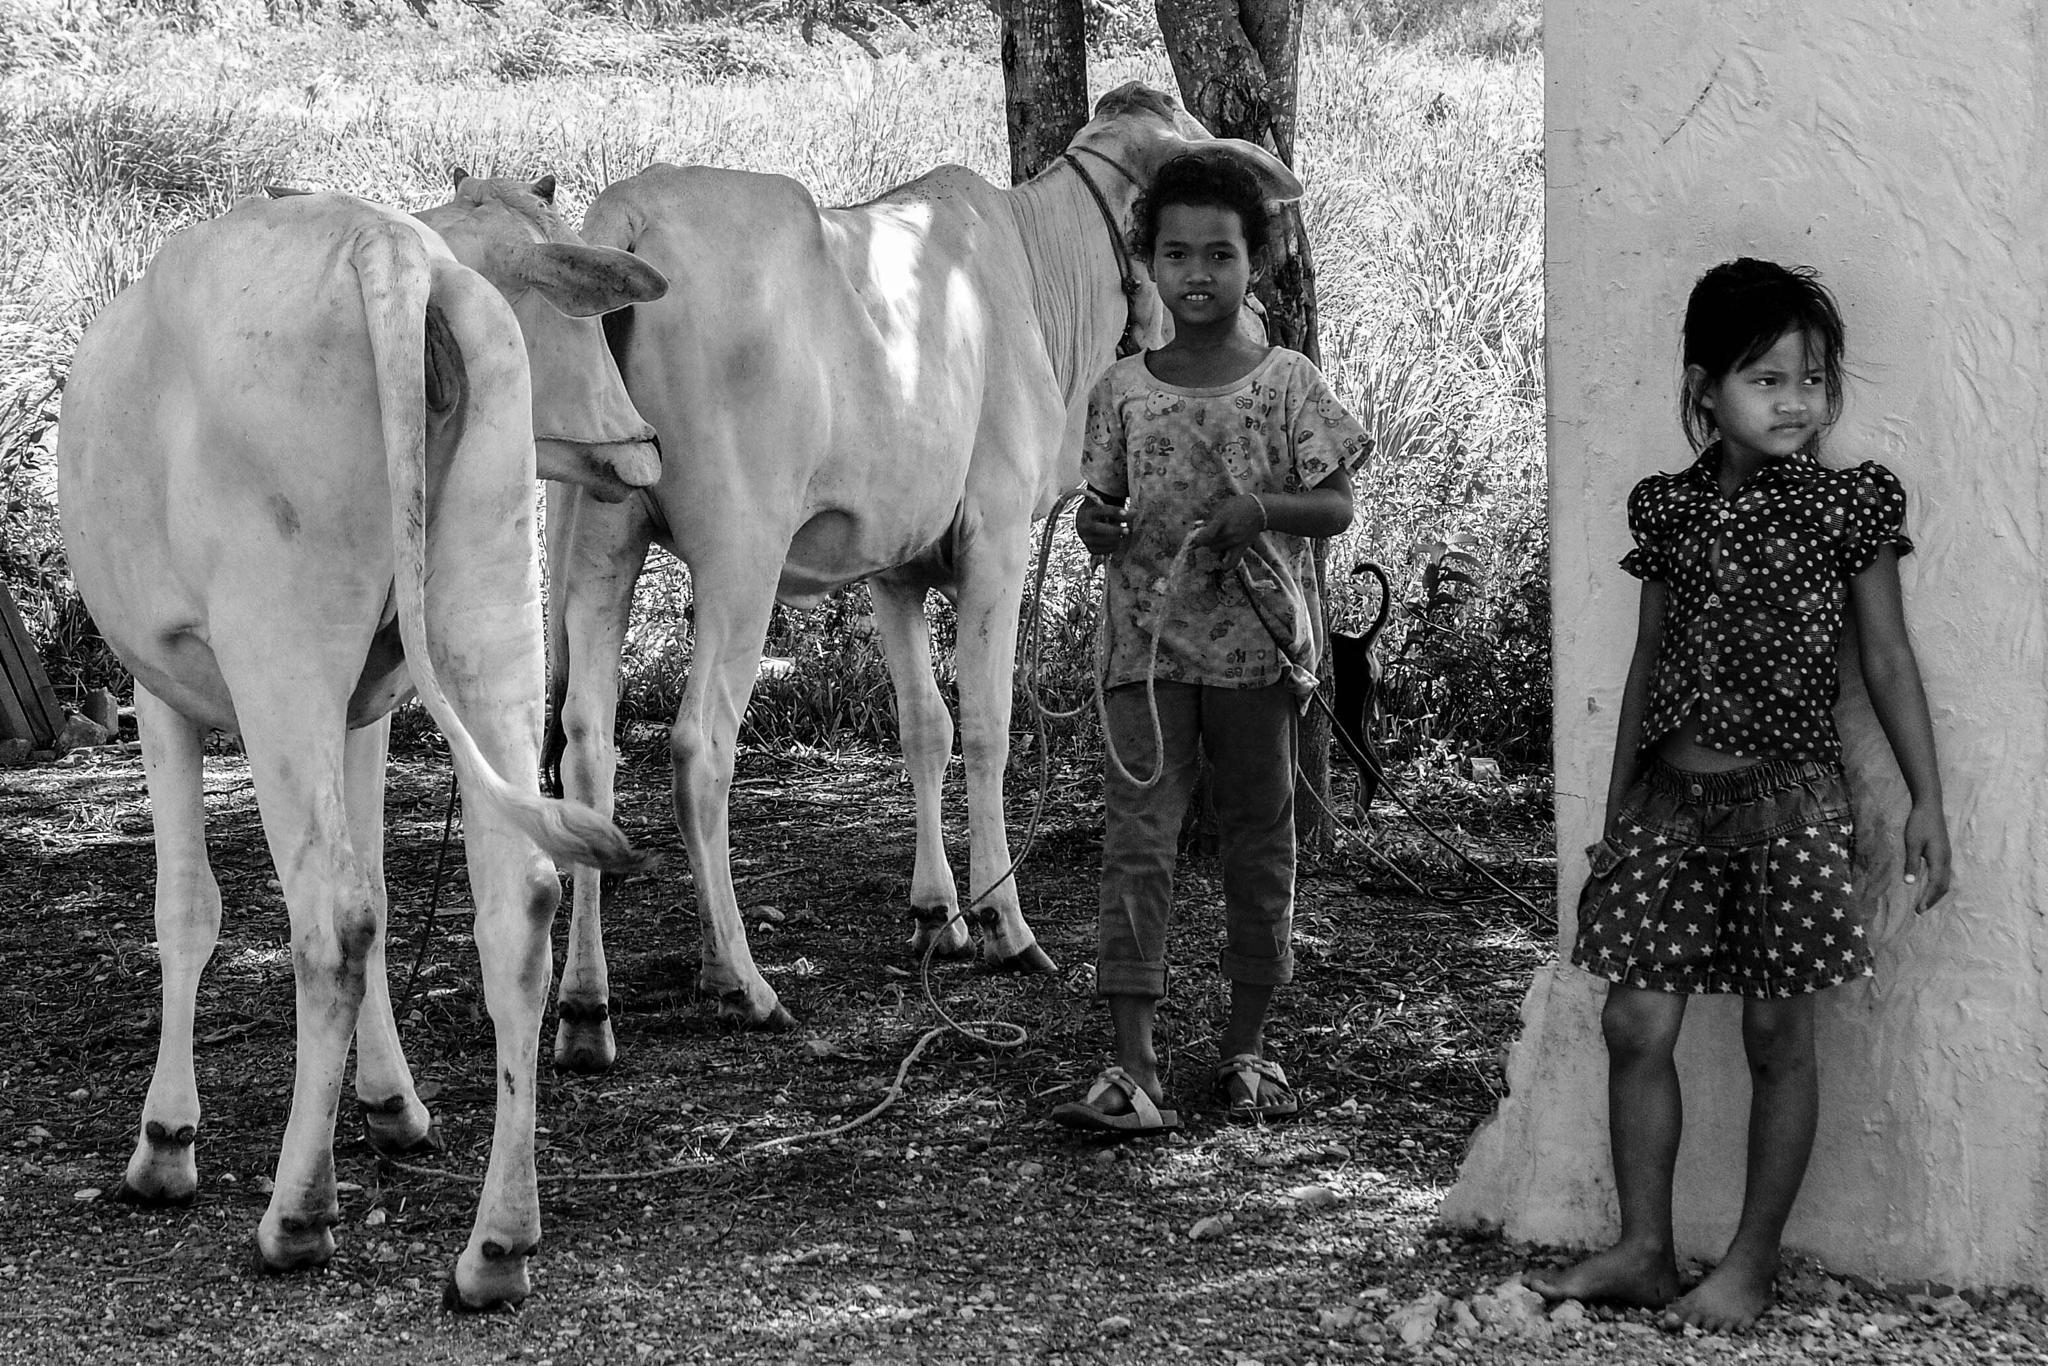 farmer kids and their cows  by amelia bertmar